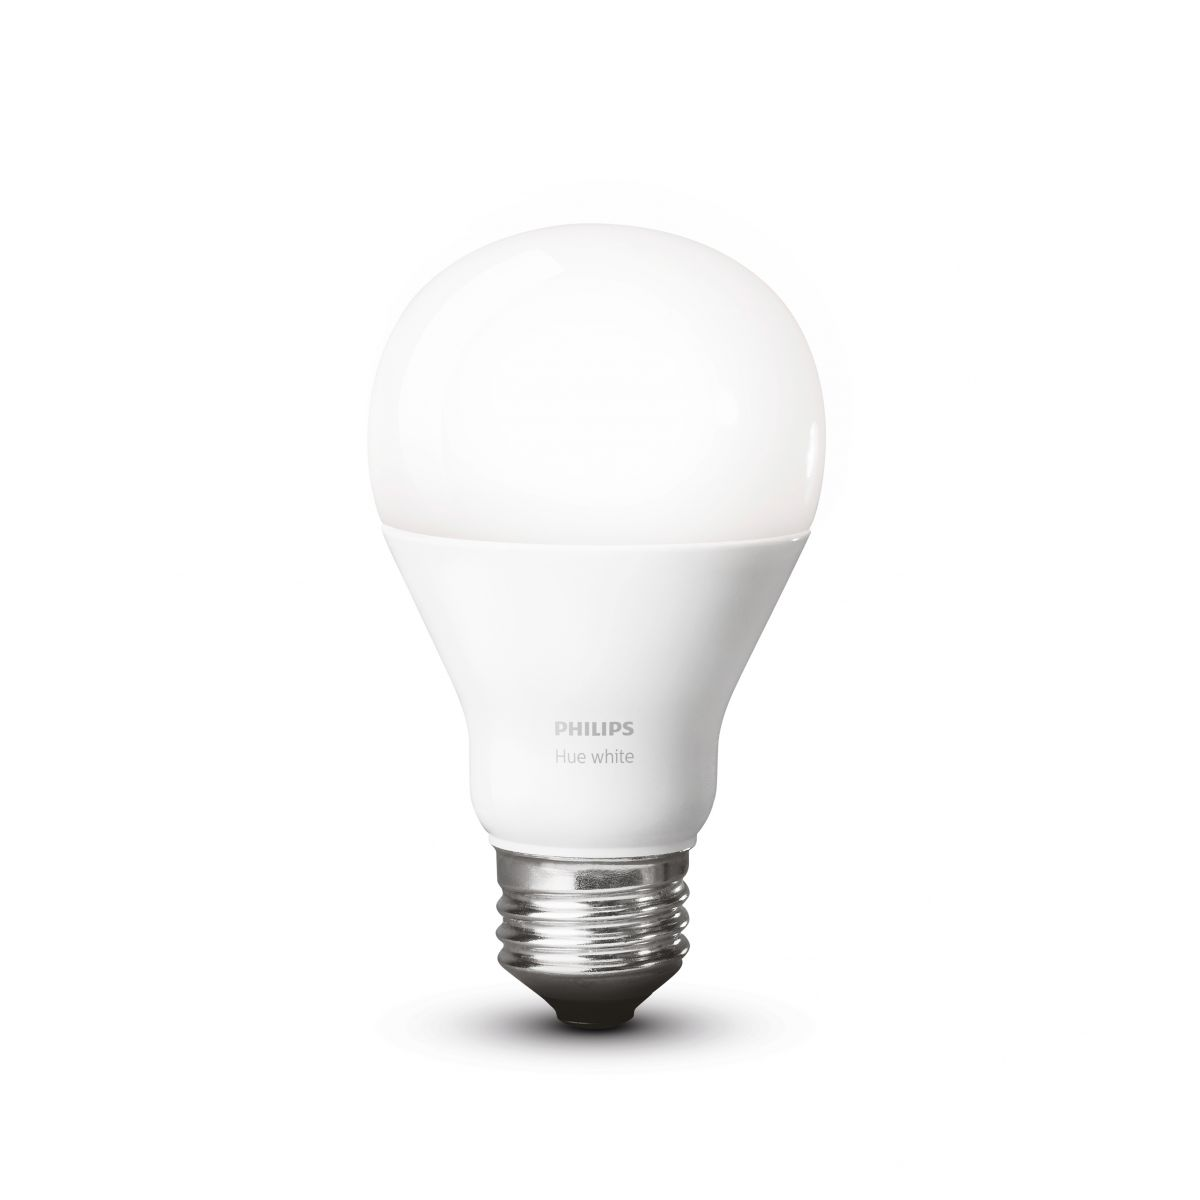 philips hue leuchten lampen kaufen bei. Black Bedroom Furniture Sets. Home Design Ideas